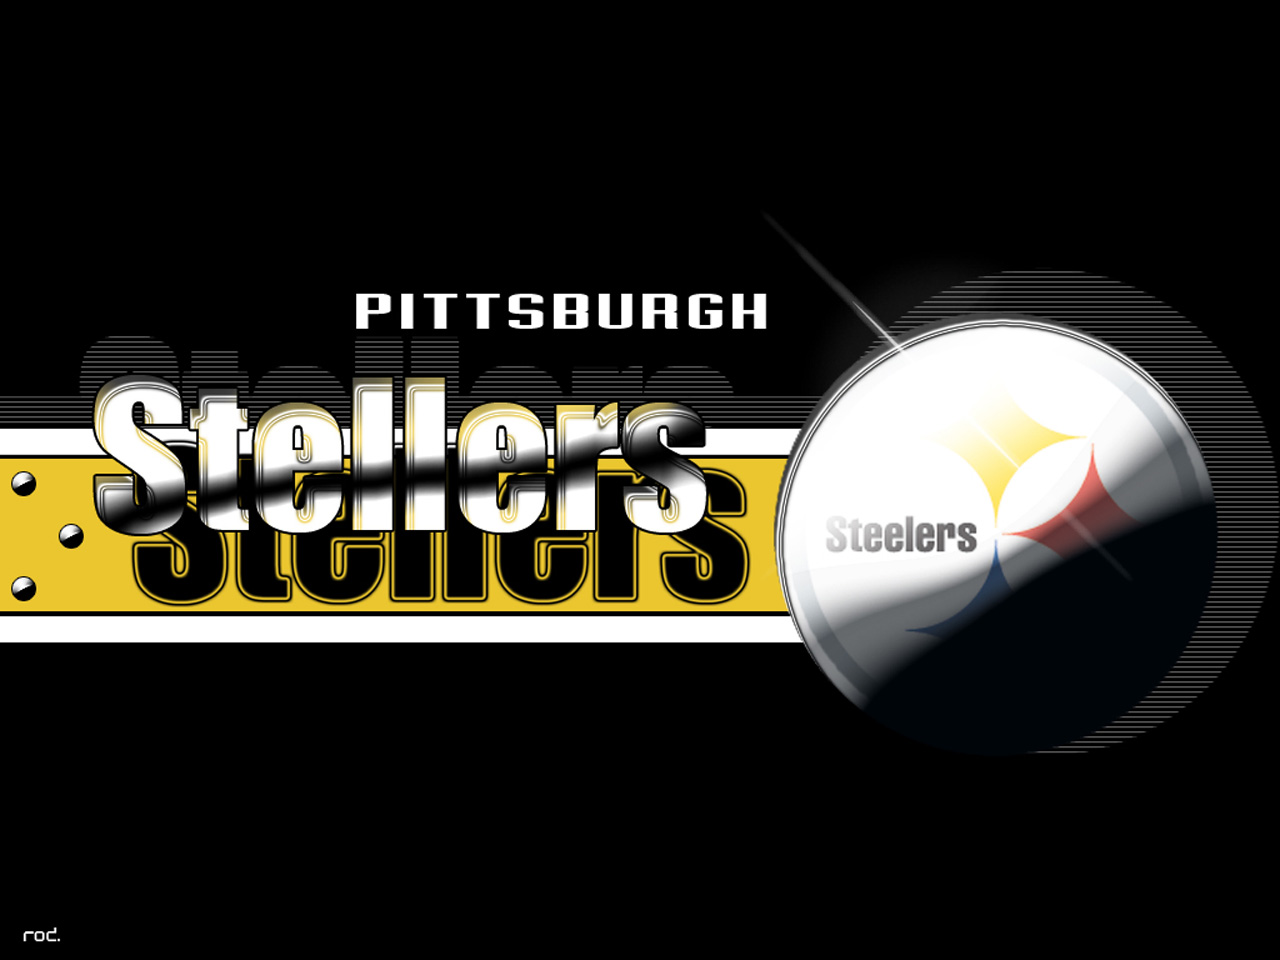 Adam Croasdell Steelers Wallpaper 2009